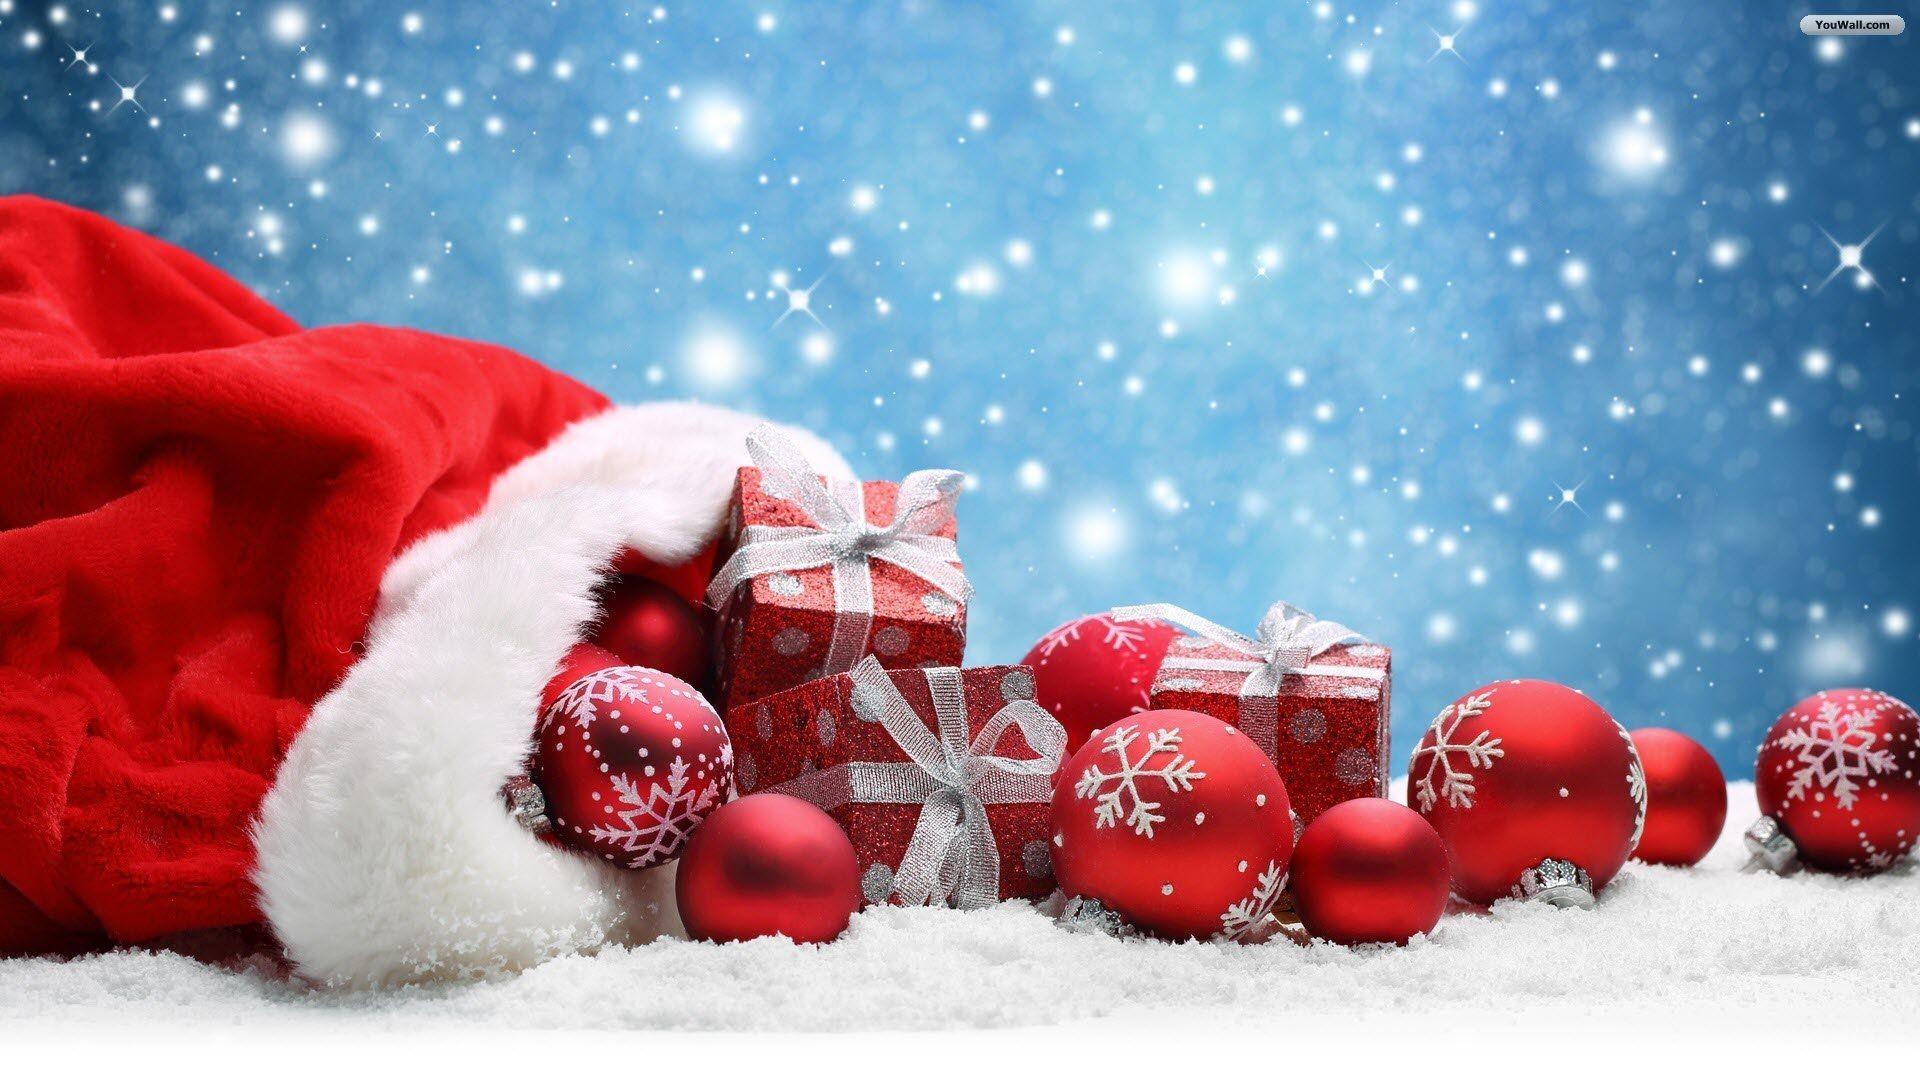 Res: 1920x1080, YouWall Christmas Gifts and Balls Wallpaper wallpaper